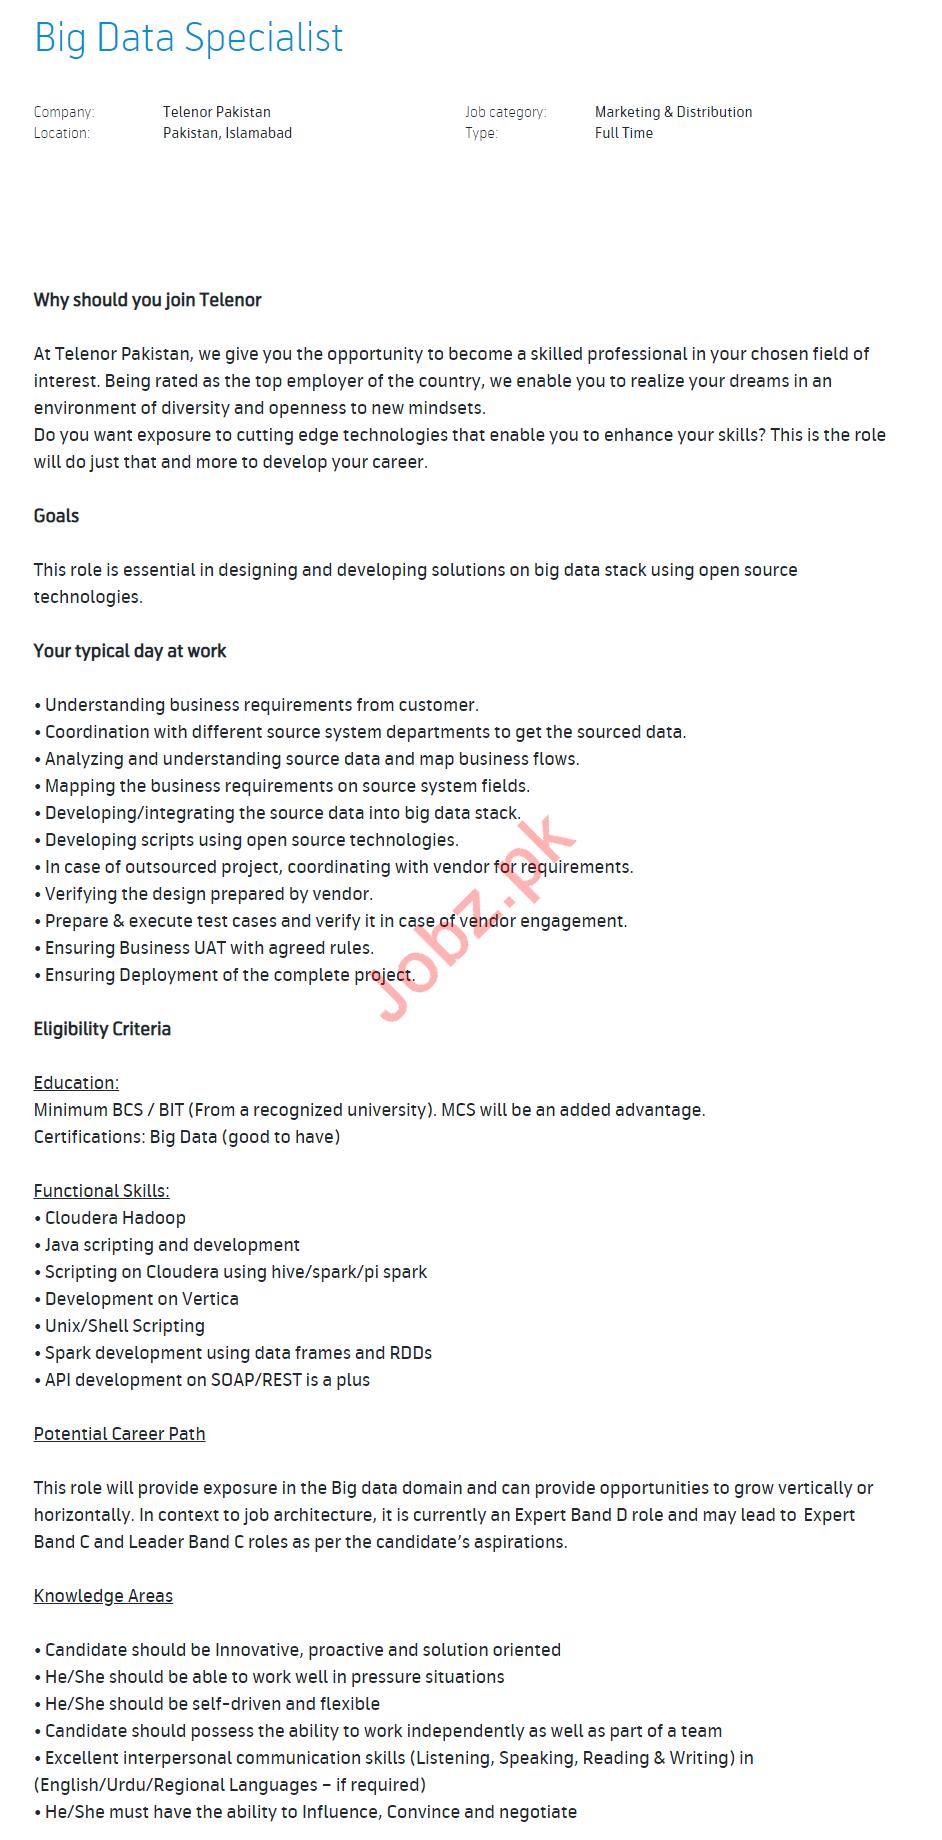 Trade Marketing Specialist & Big Data Specialist Jobs 2020